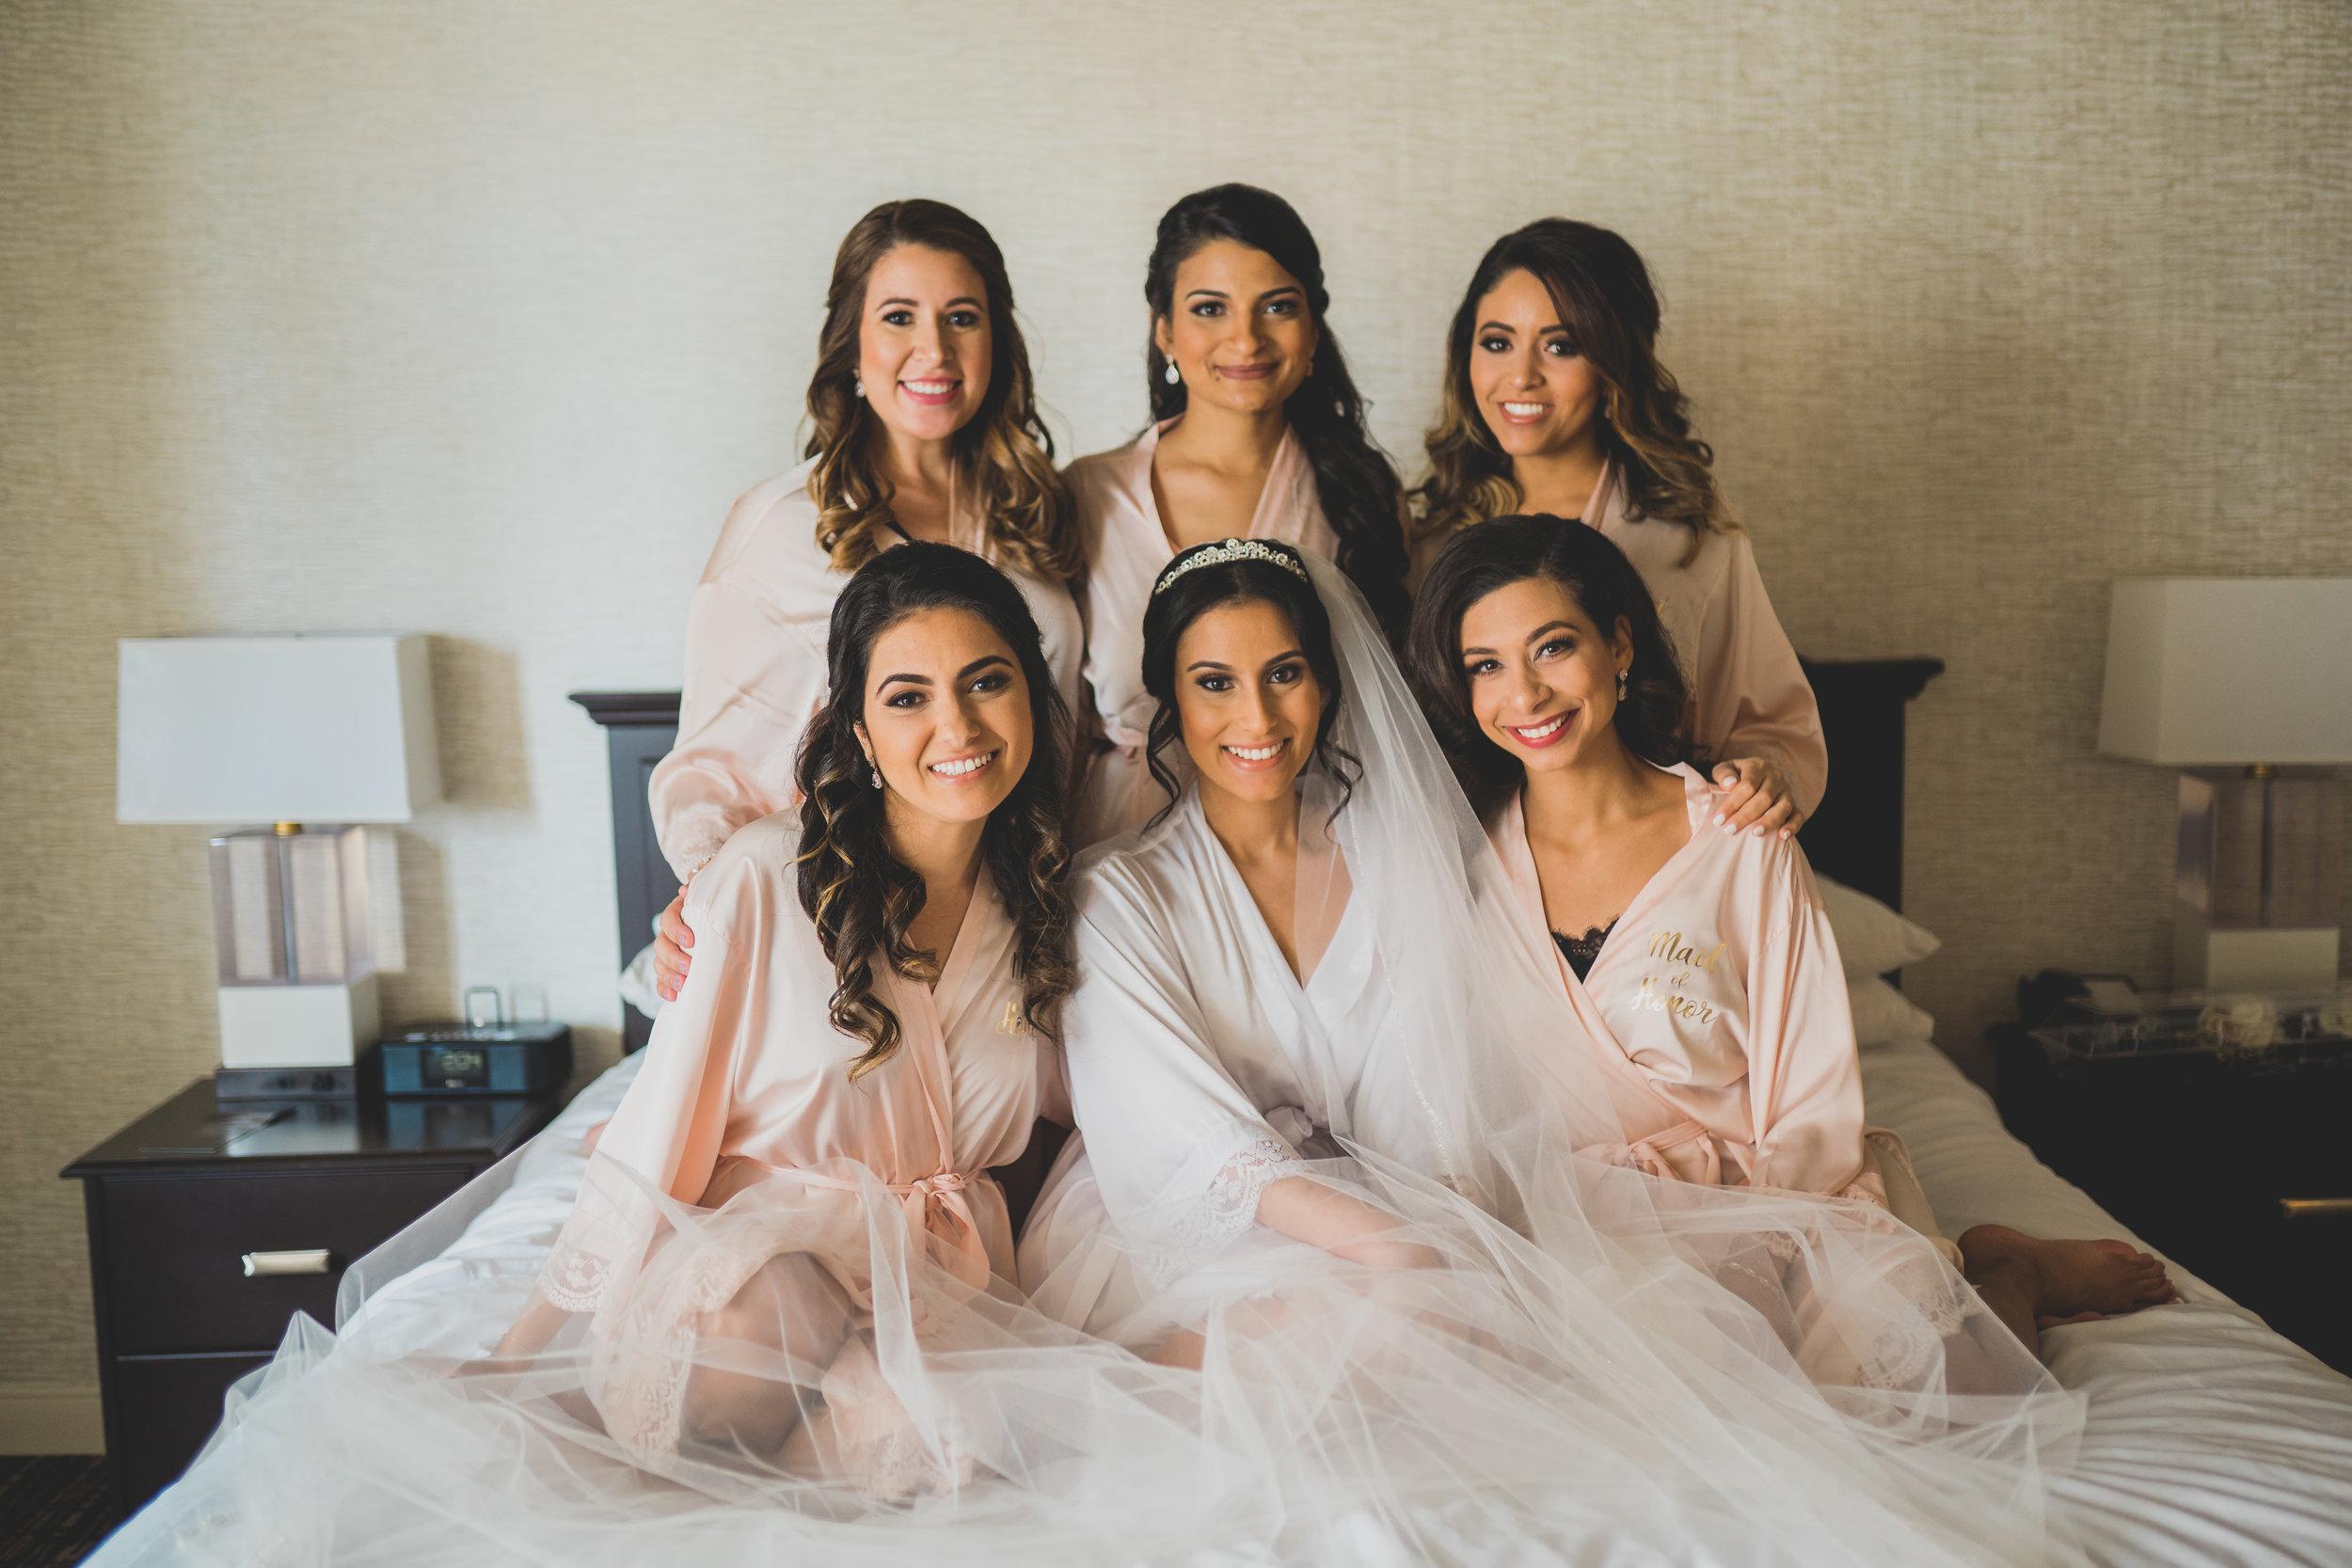 sugar-land-tx-wedding-photography-marriott-bridesmaids